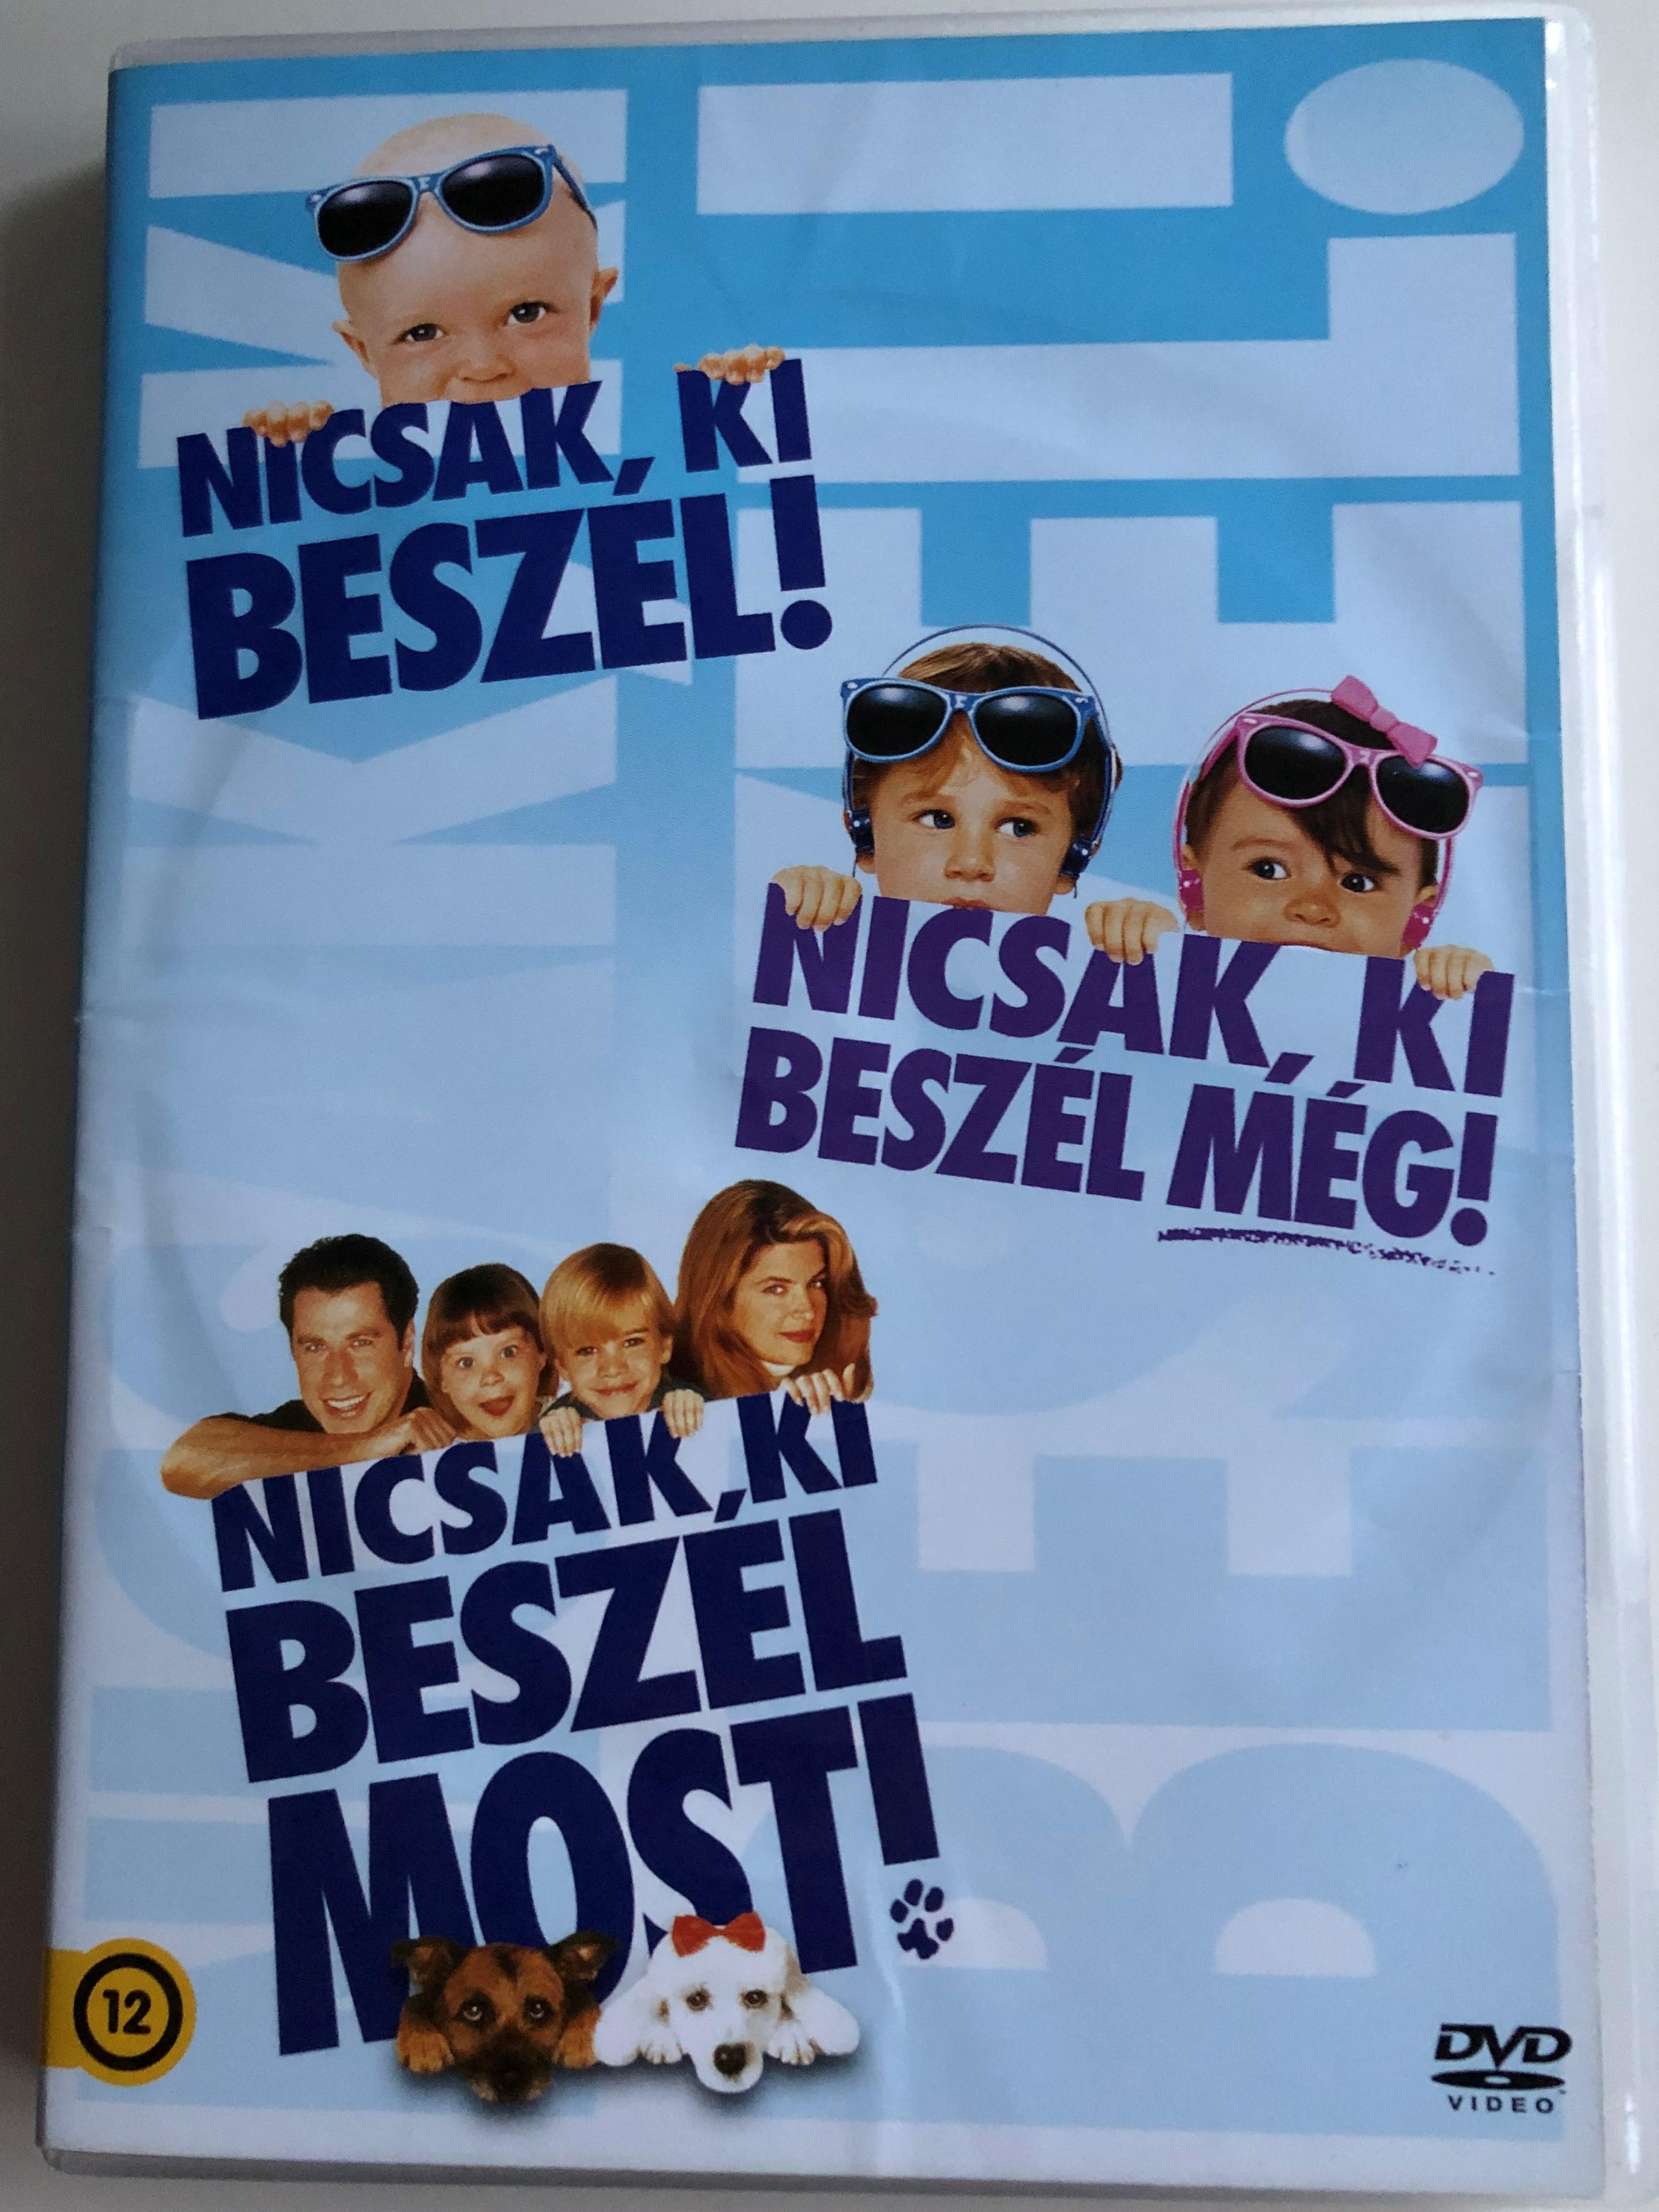 look-who-s-talking-dvd-set-nicsak-ki-besz-l-look-who-s-talking-too-look-who-s-talking-now-1.jpg